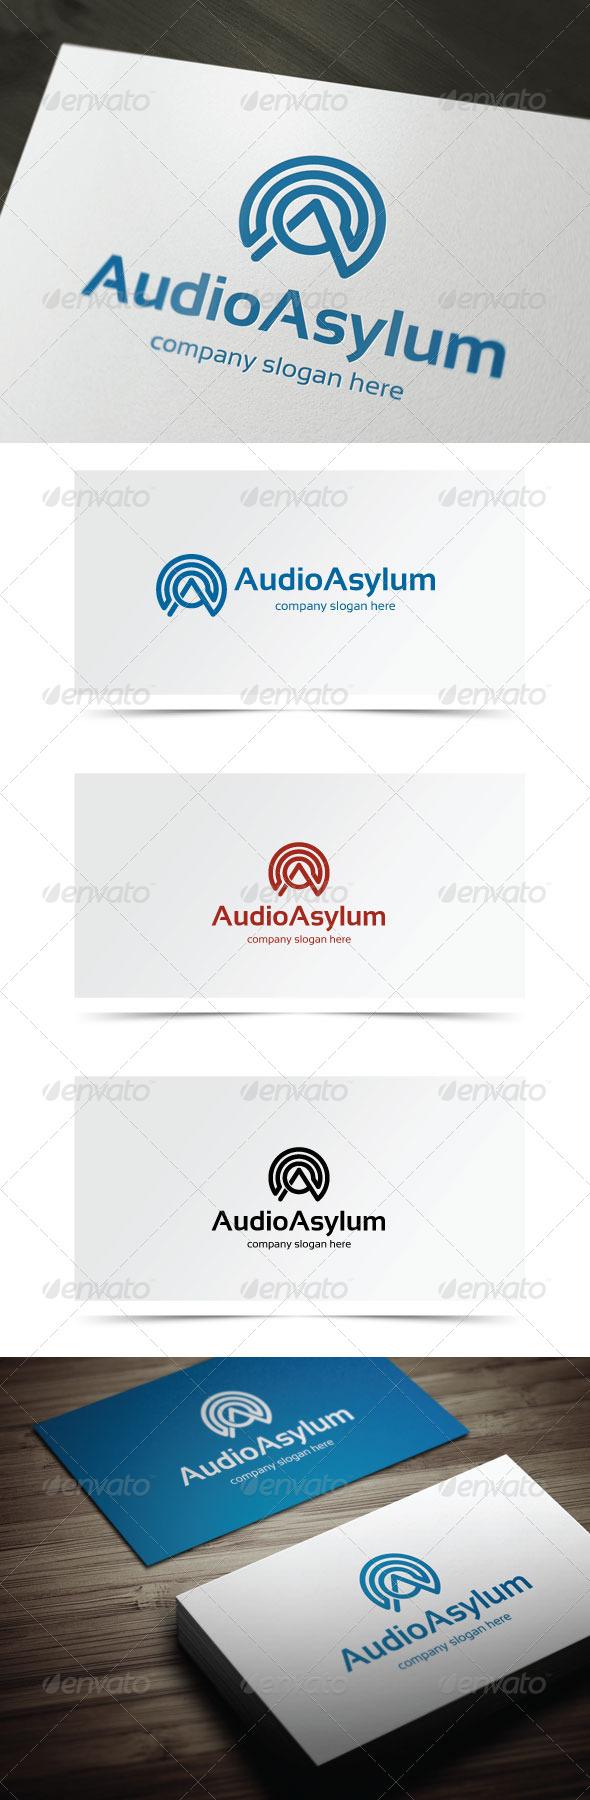 Audio Asylum - Letters Logo Templates